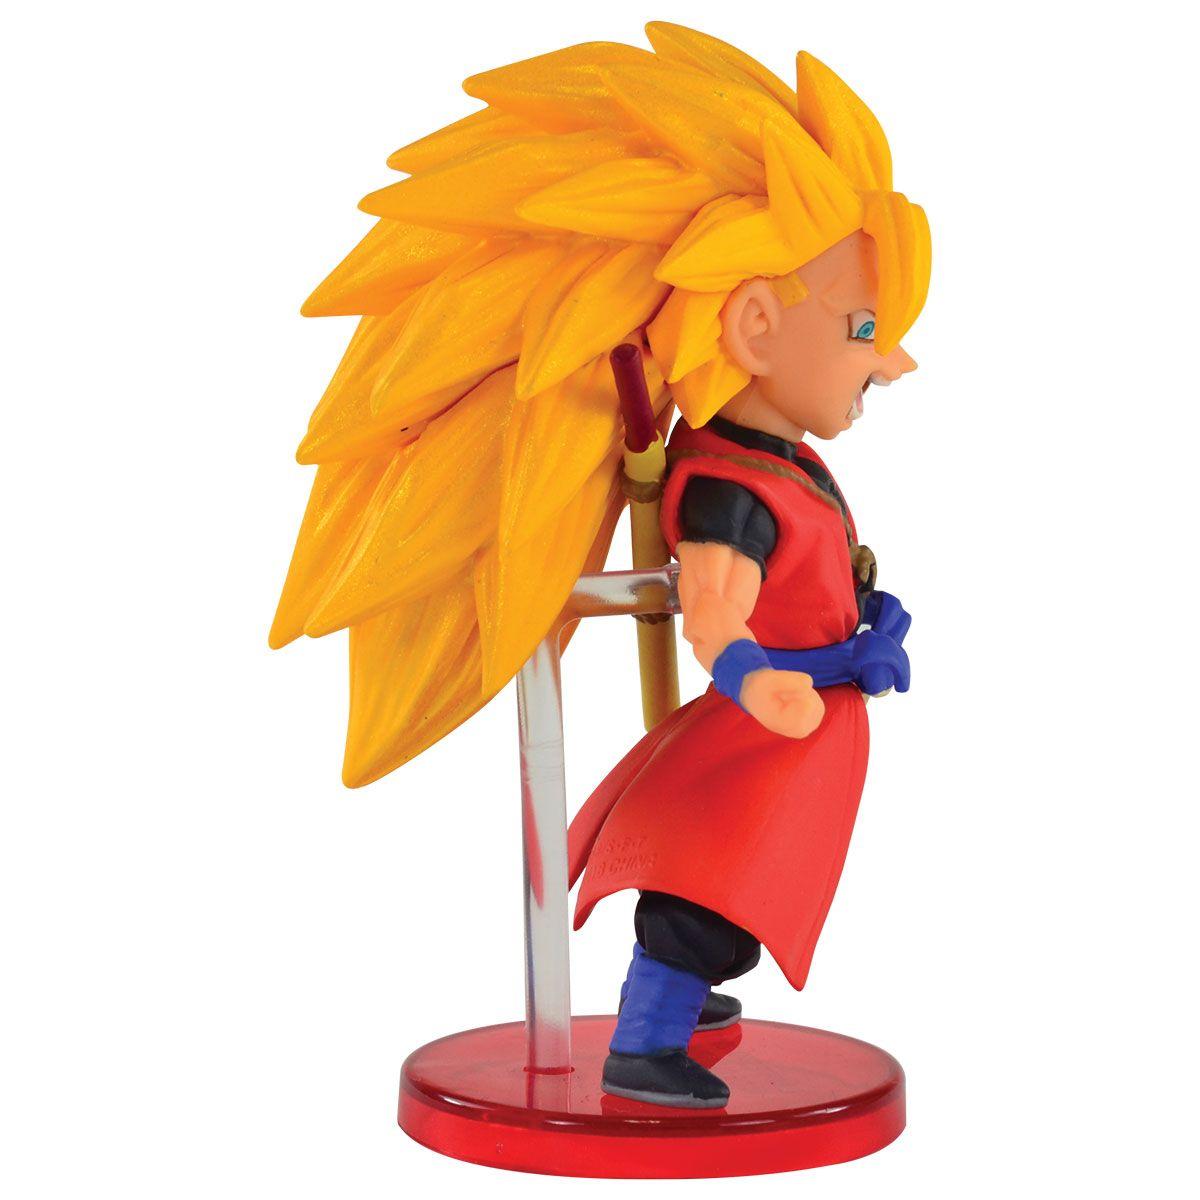 Action Figure Son Goku WCF: Dragon Ball (Boneco Colecionável) - Banpresto